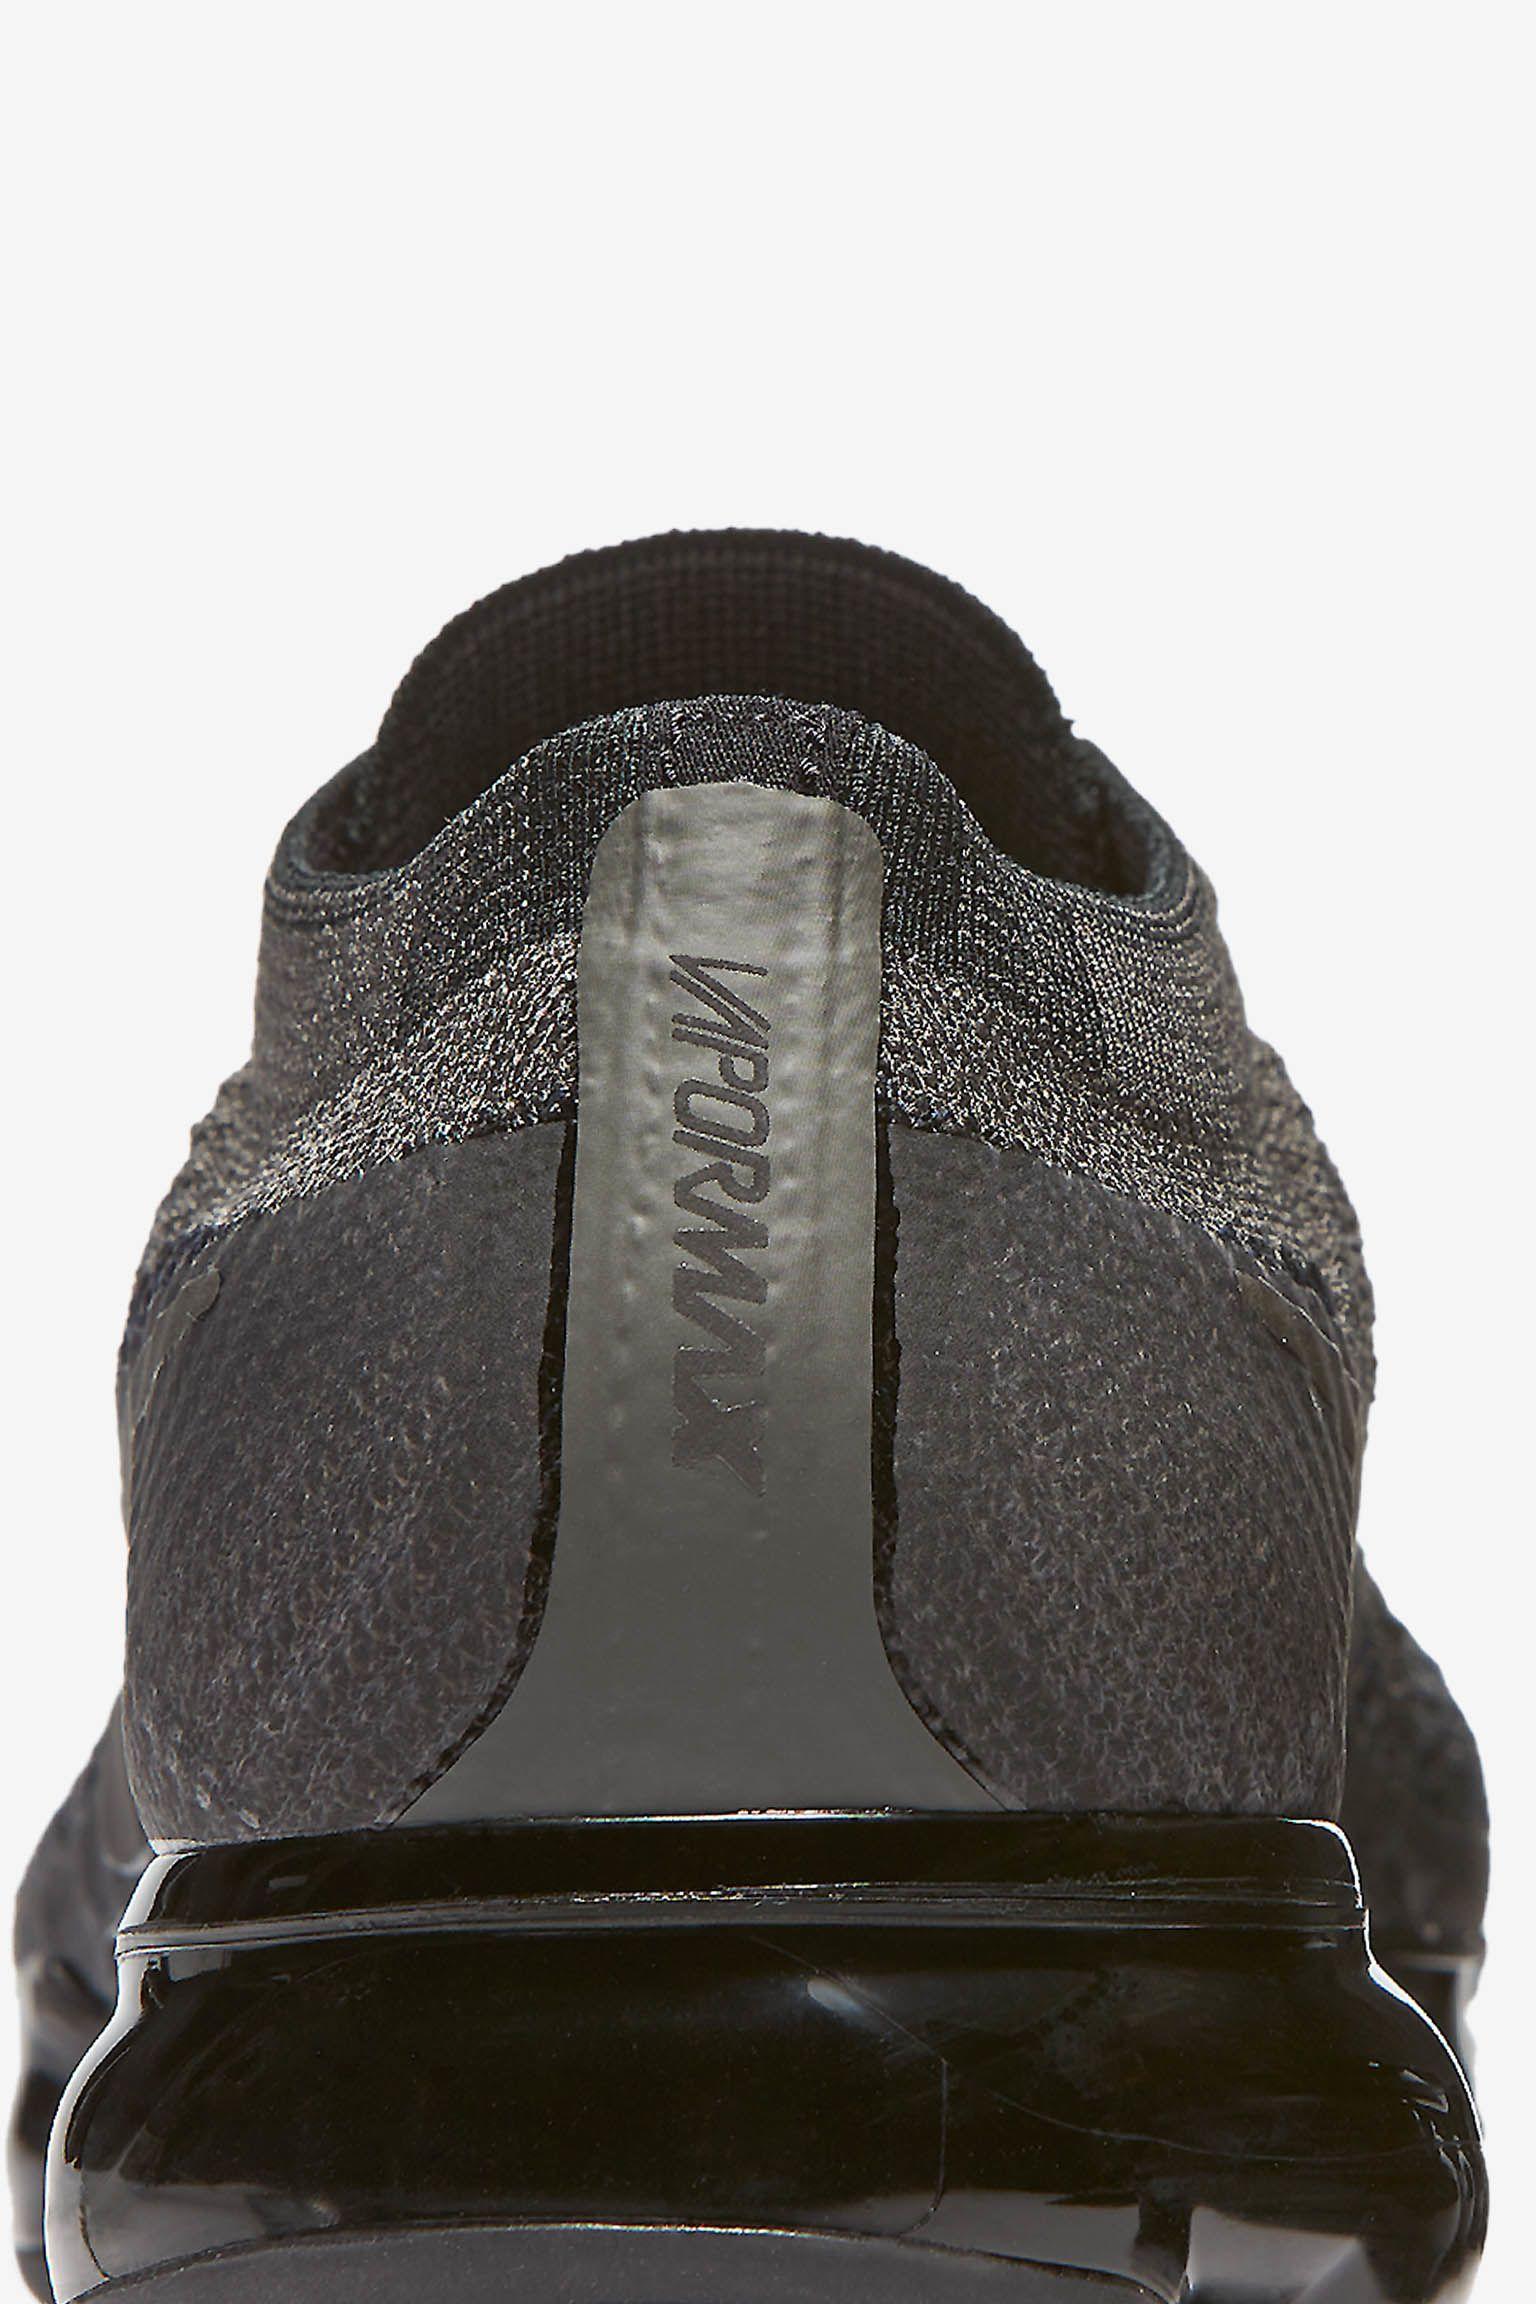 Nike Women's Air Vapormax 'Midnight Fog & Black' Release Date